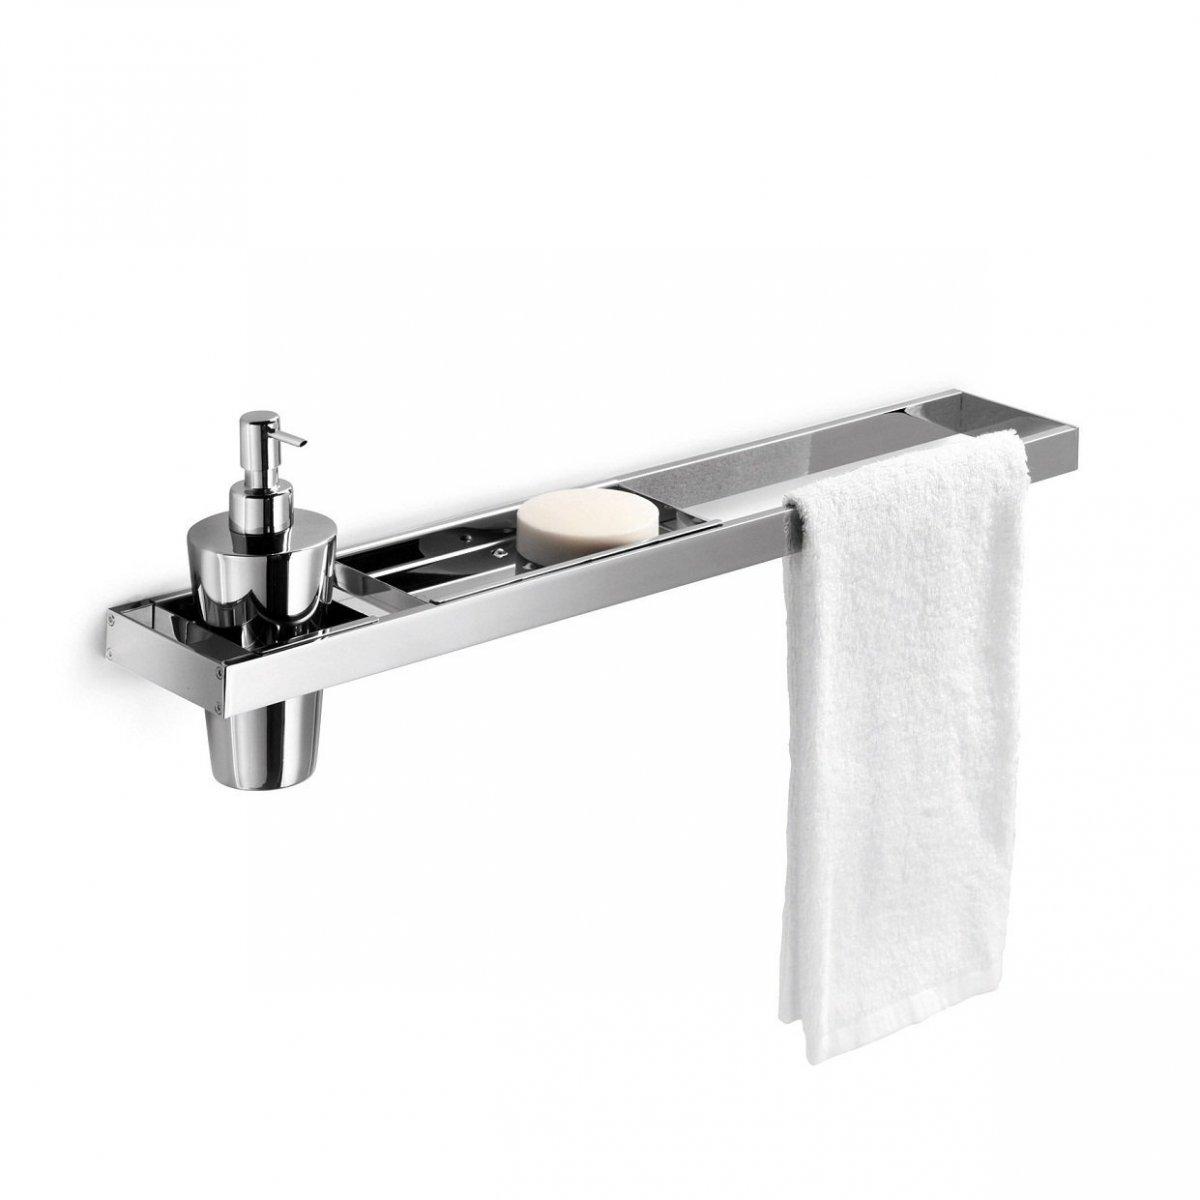 Lineabeta skuara 5281x lineabeta bagno accessori - Lineabeta accessori bagno ...